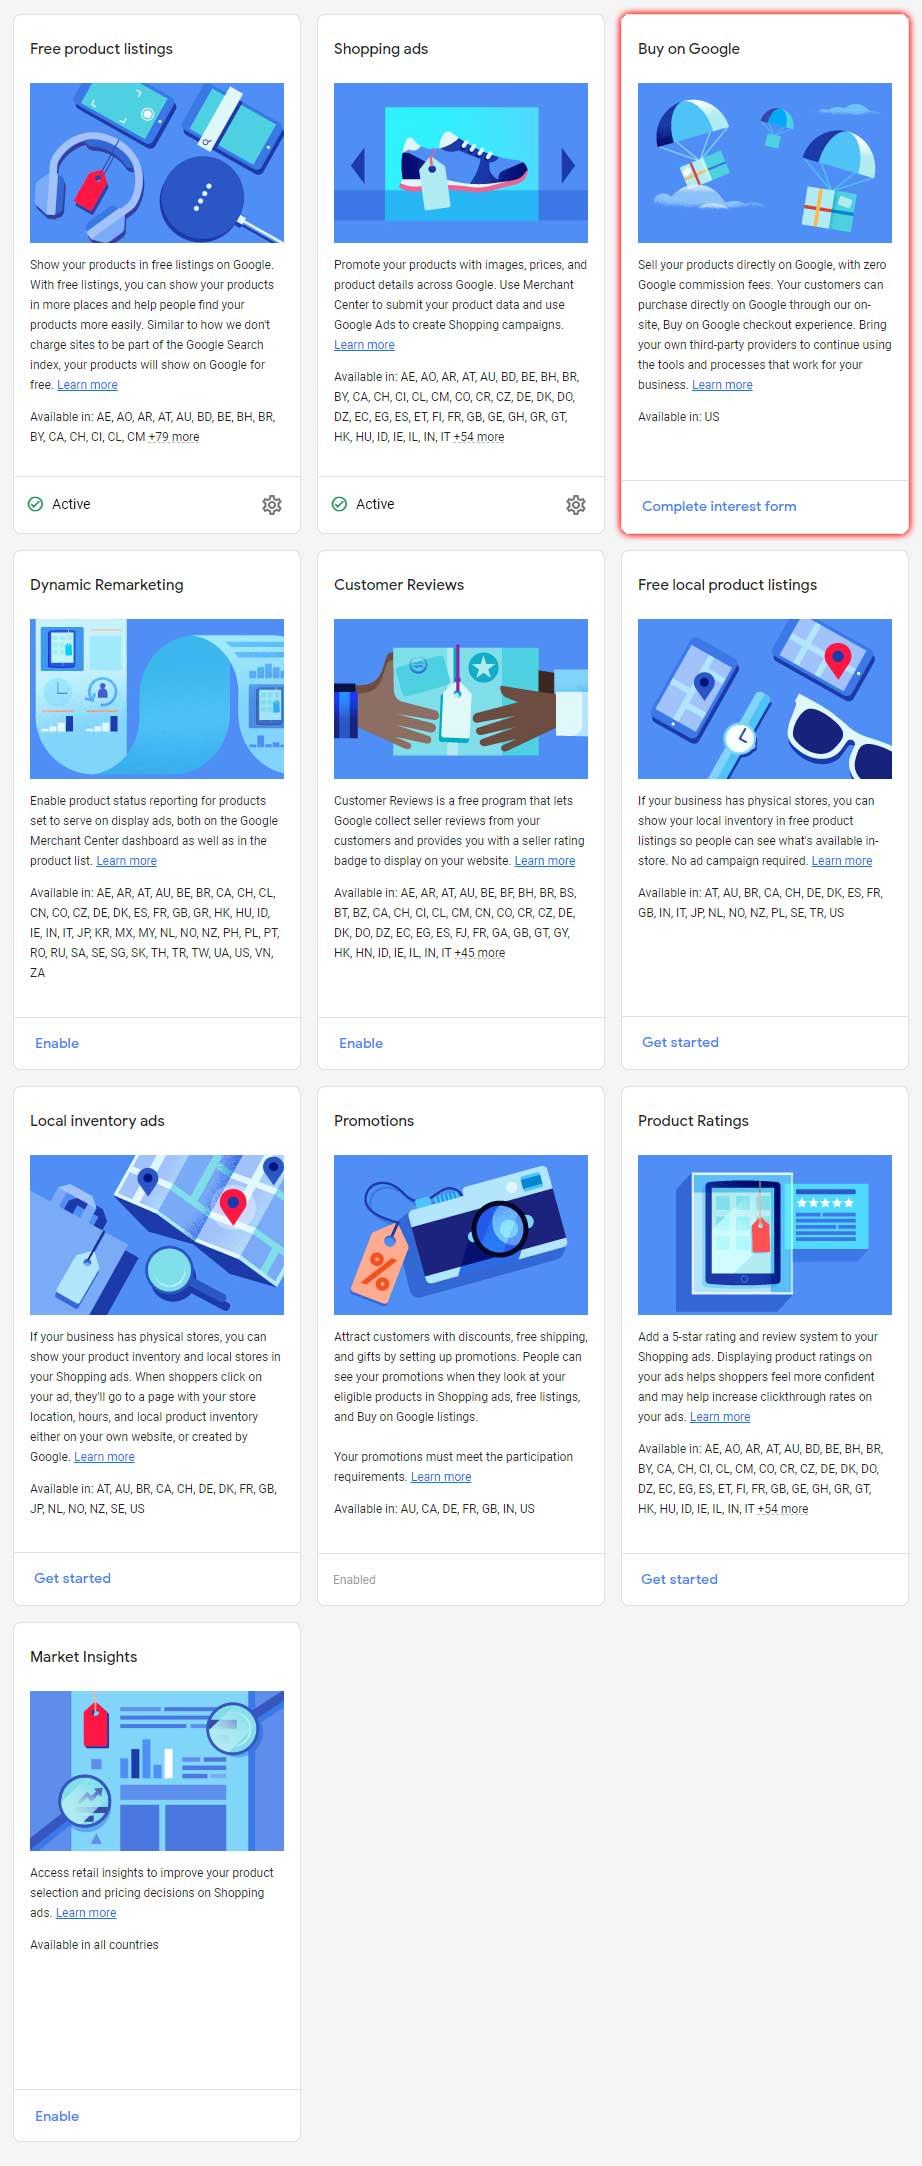 Program Options within Google Merchant Center, including Buy On Google